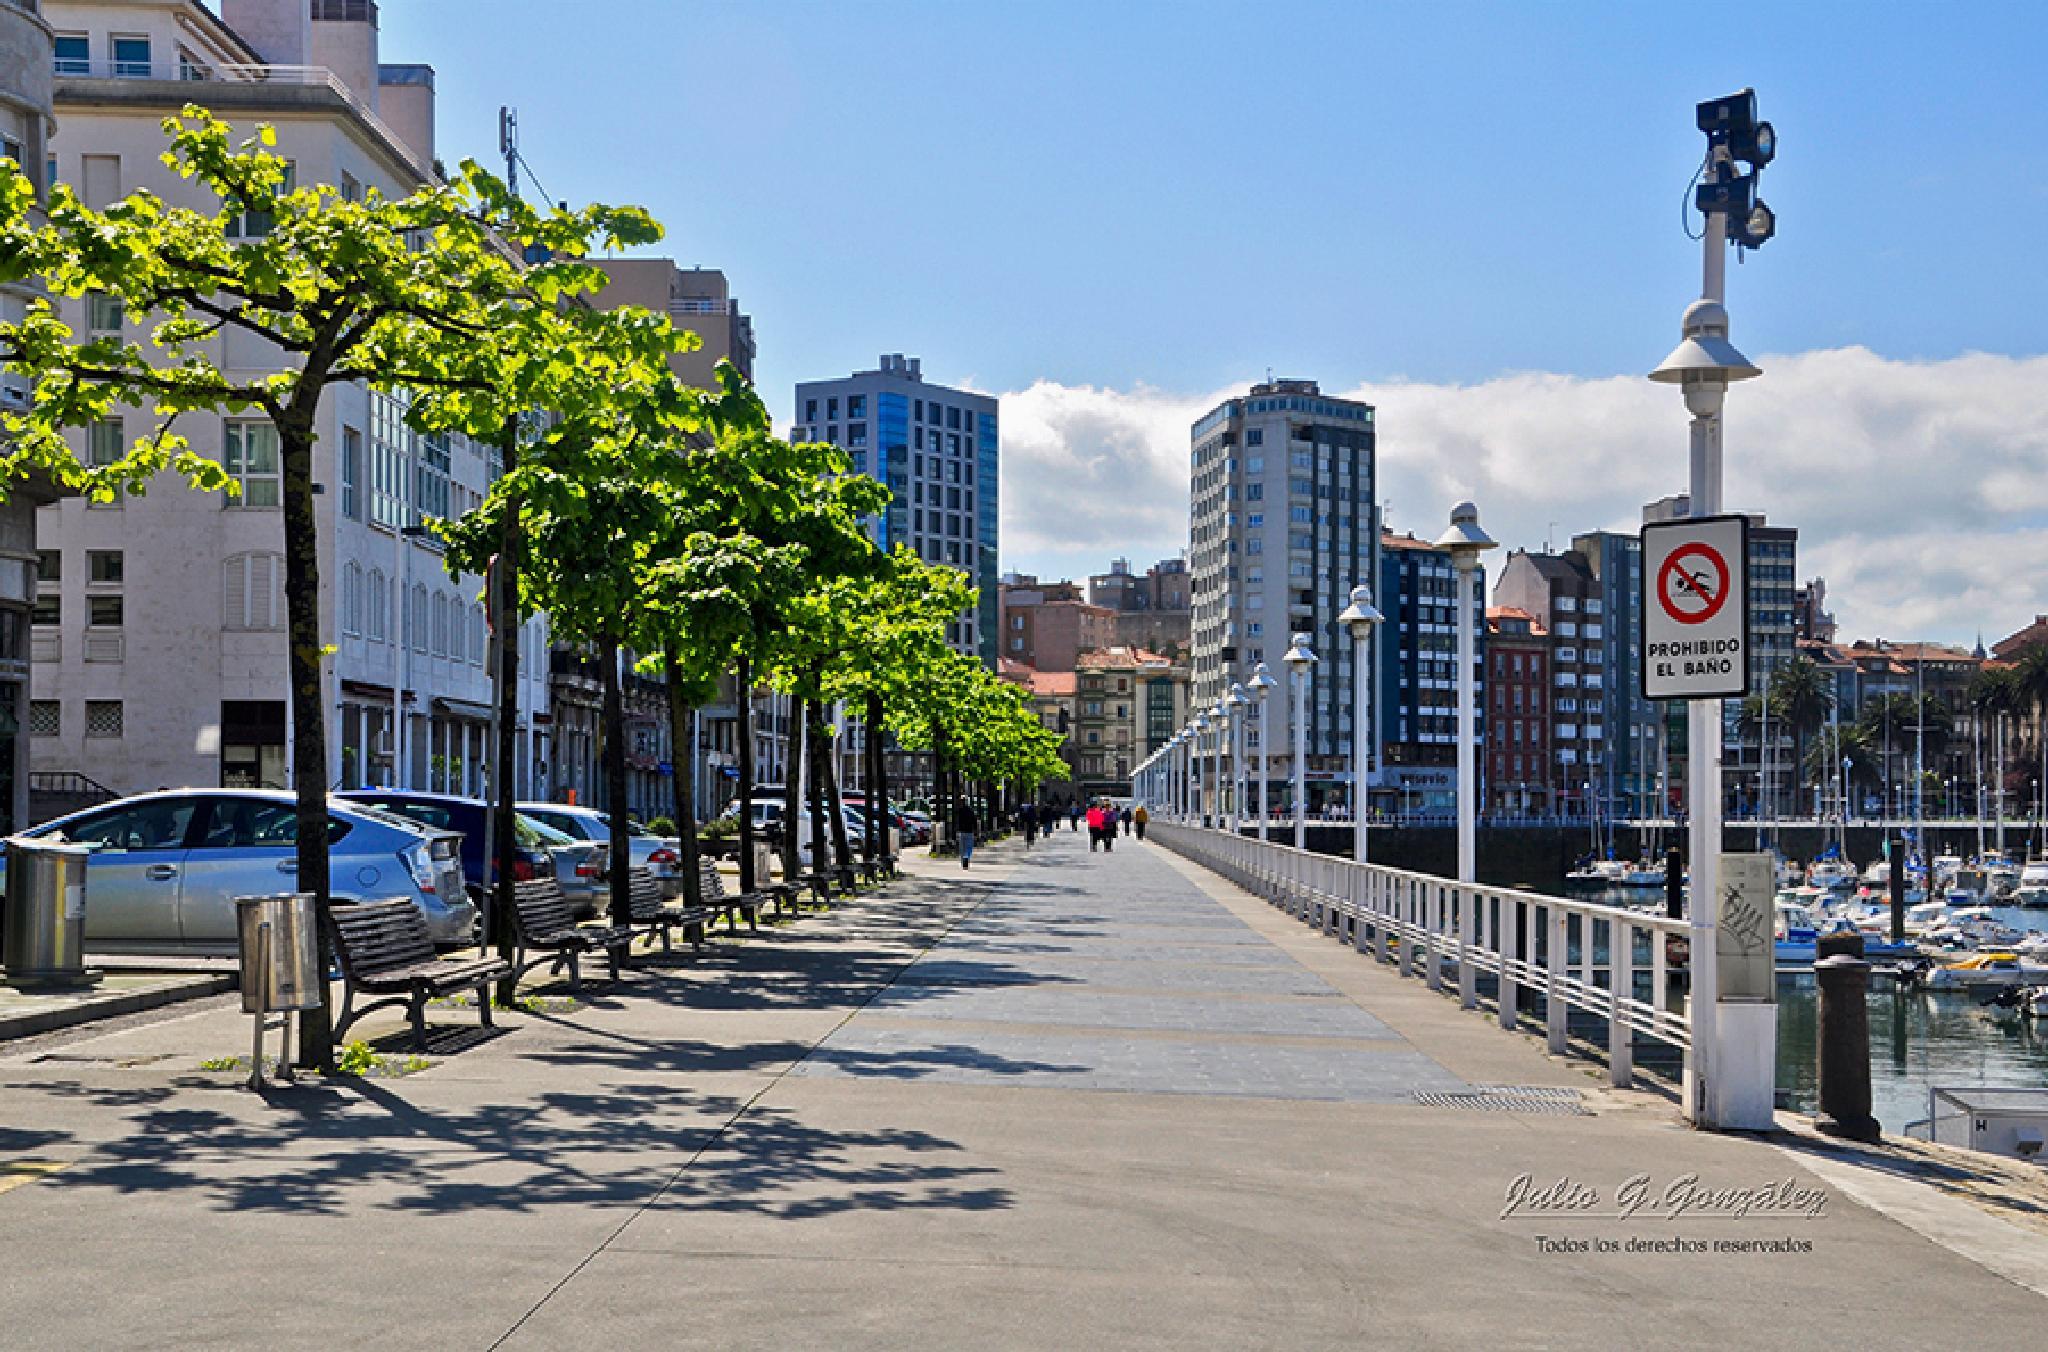 Paseo del Puerto Deportivo de Gijón by Julio G.González